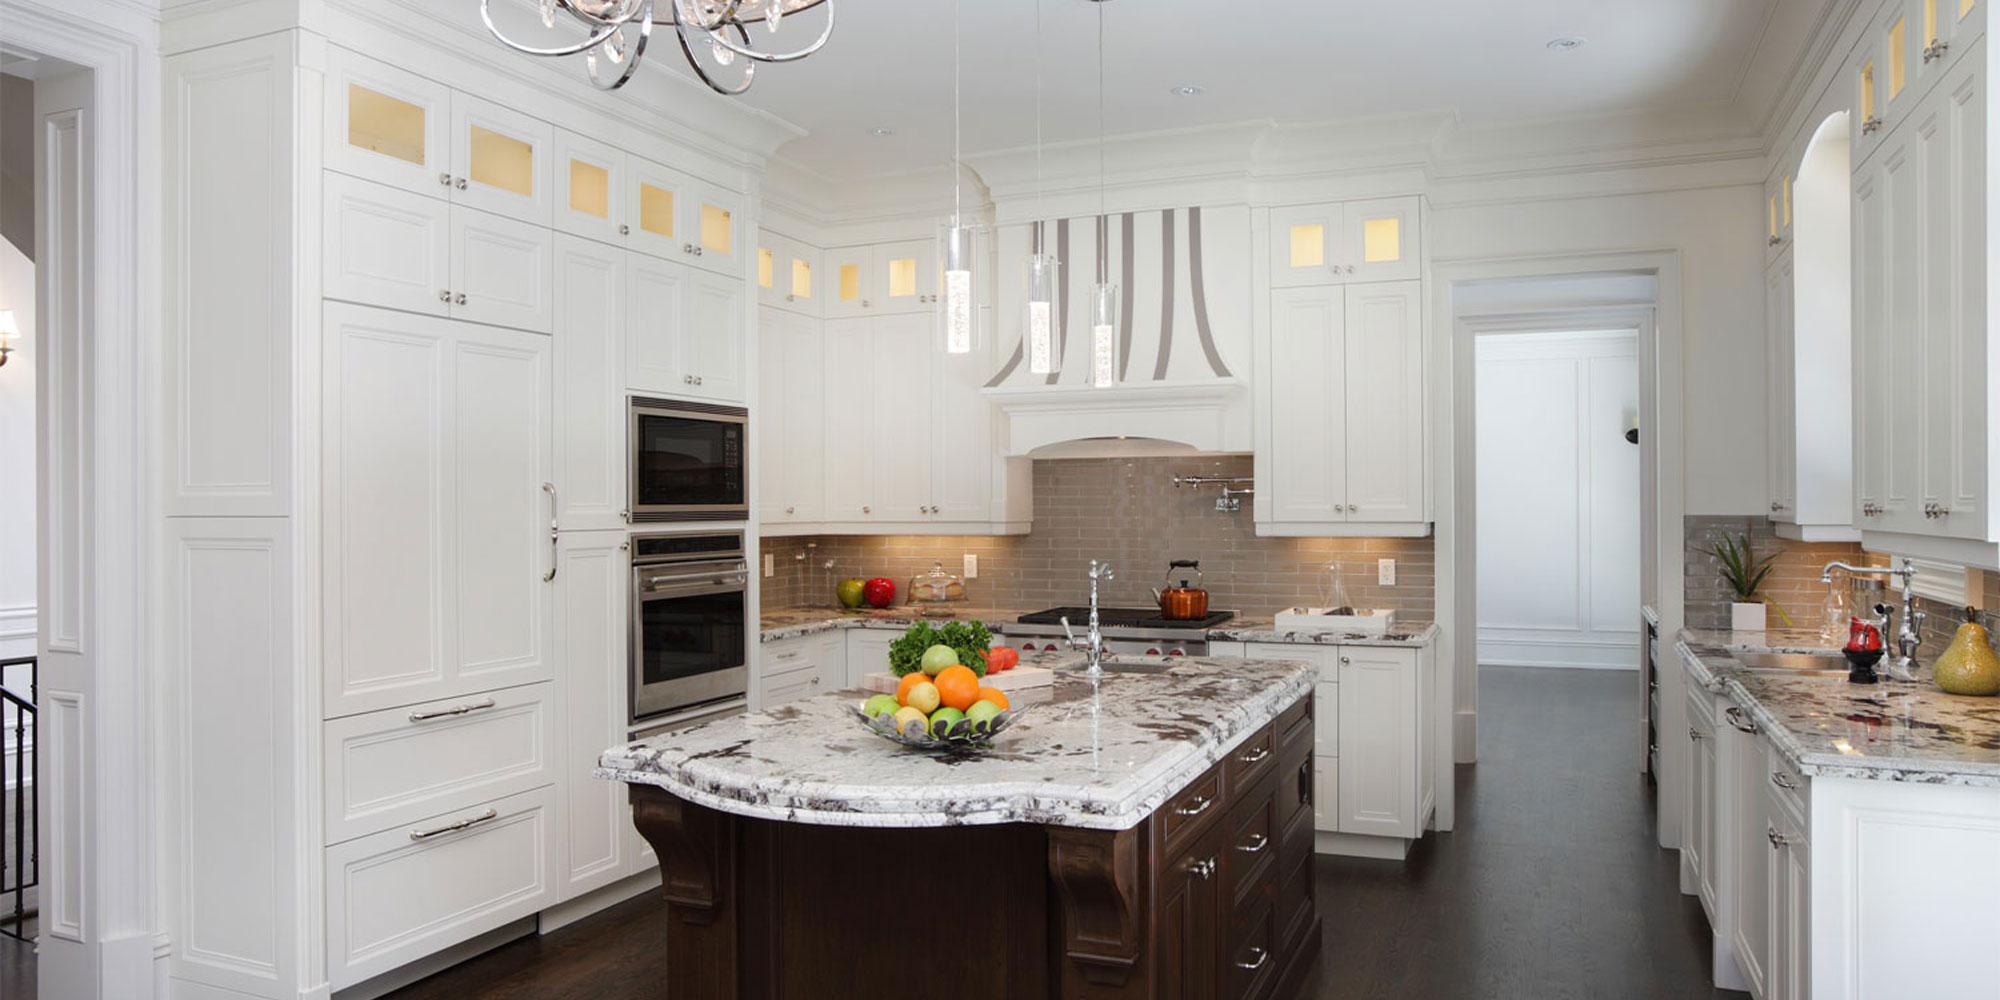 Custom Kitchen Cabinets Affordable Cabinet Doors Ltd